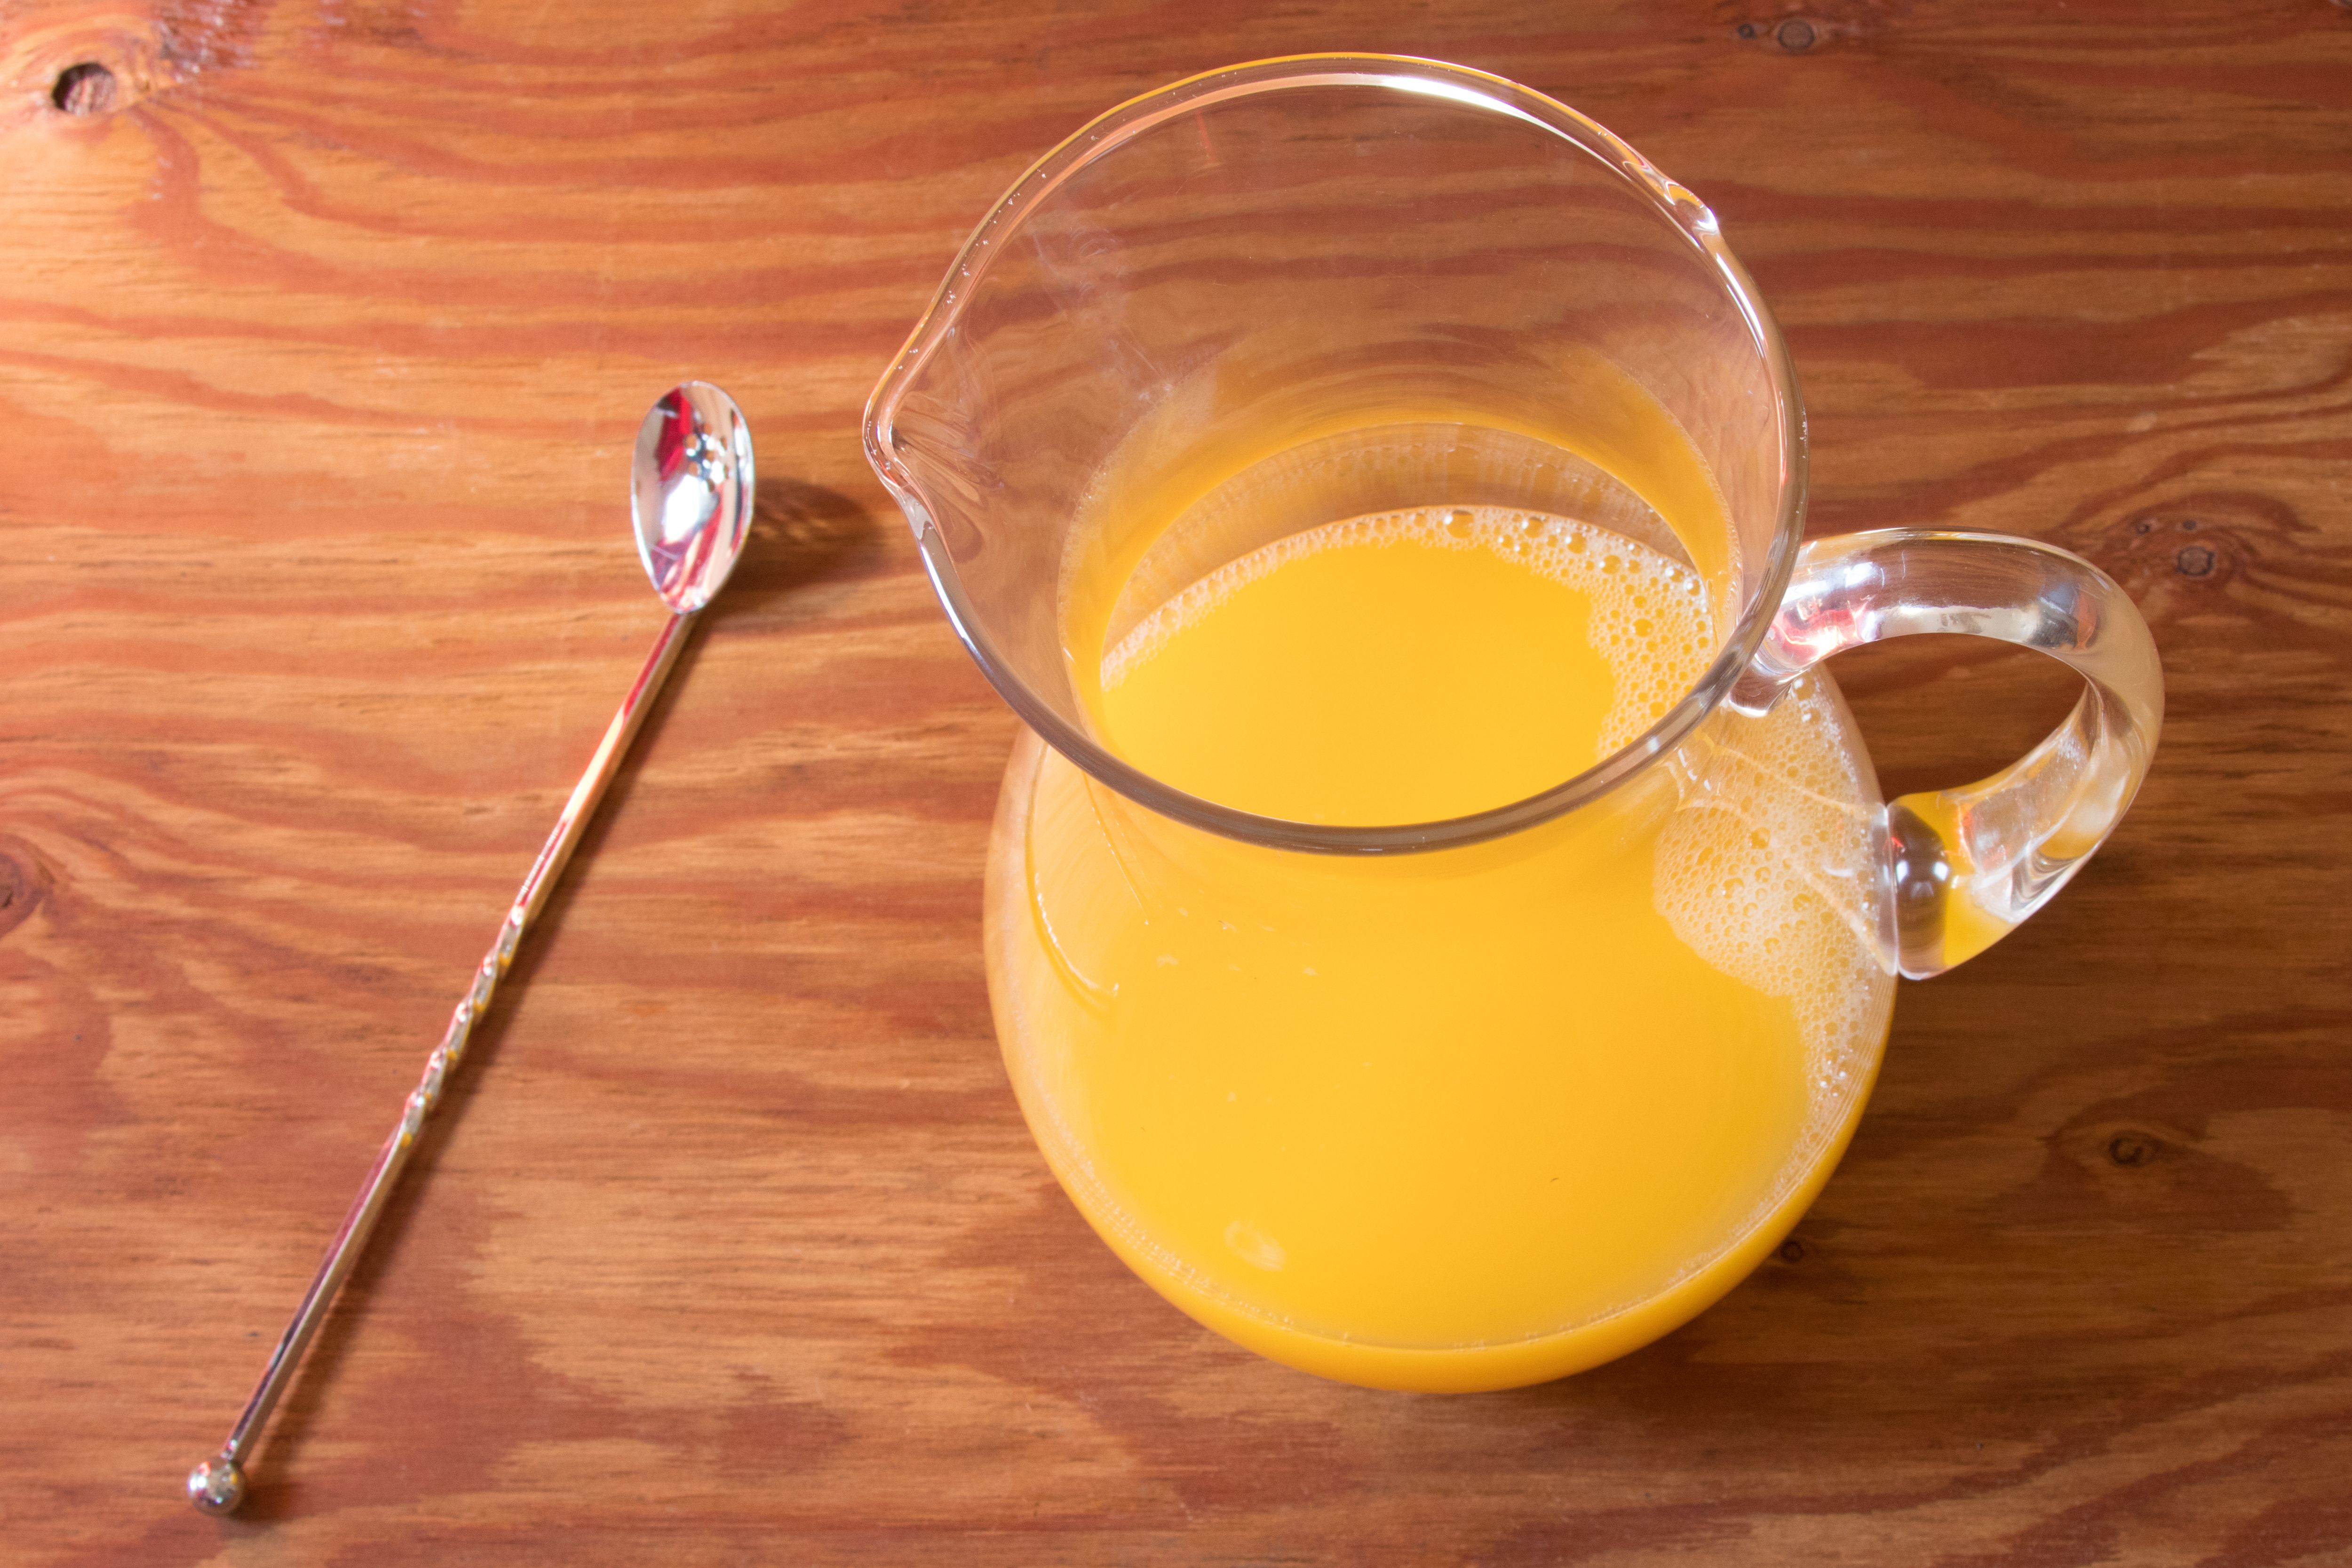 Homemade Basil-Rosemary Orangeade